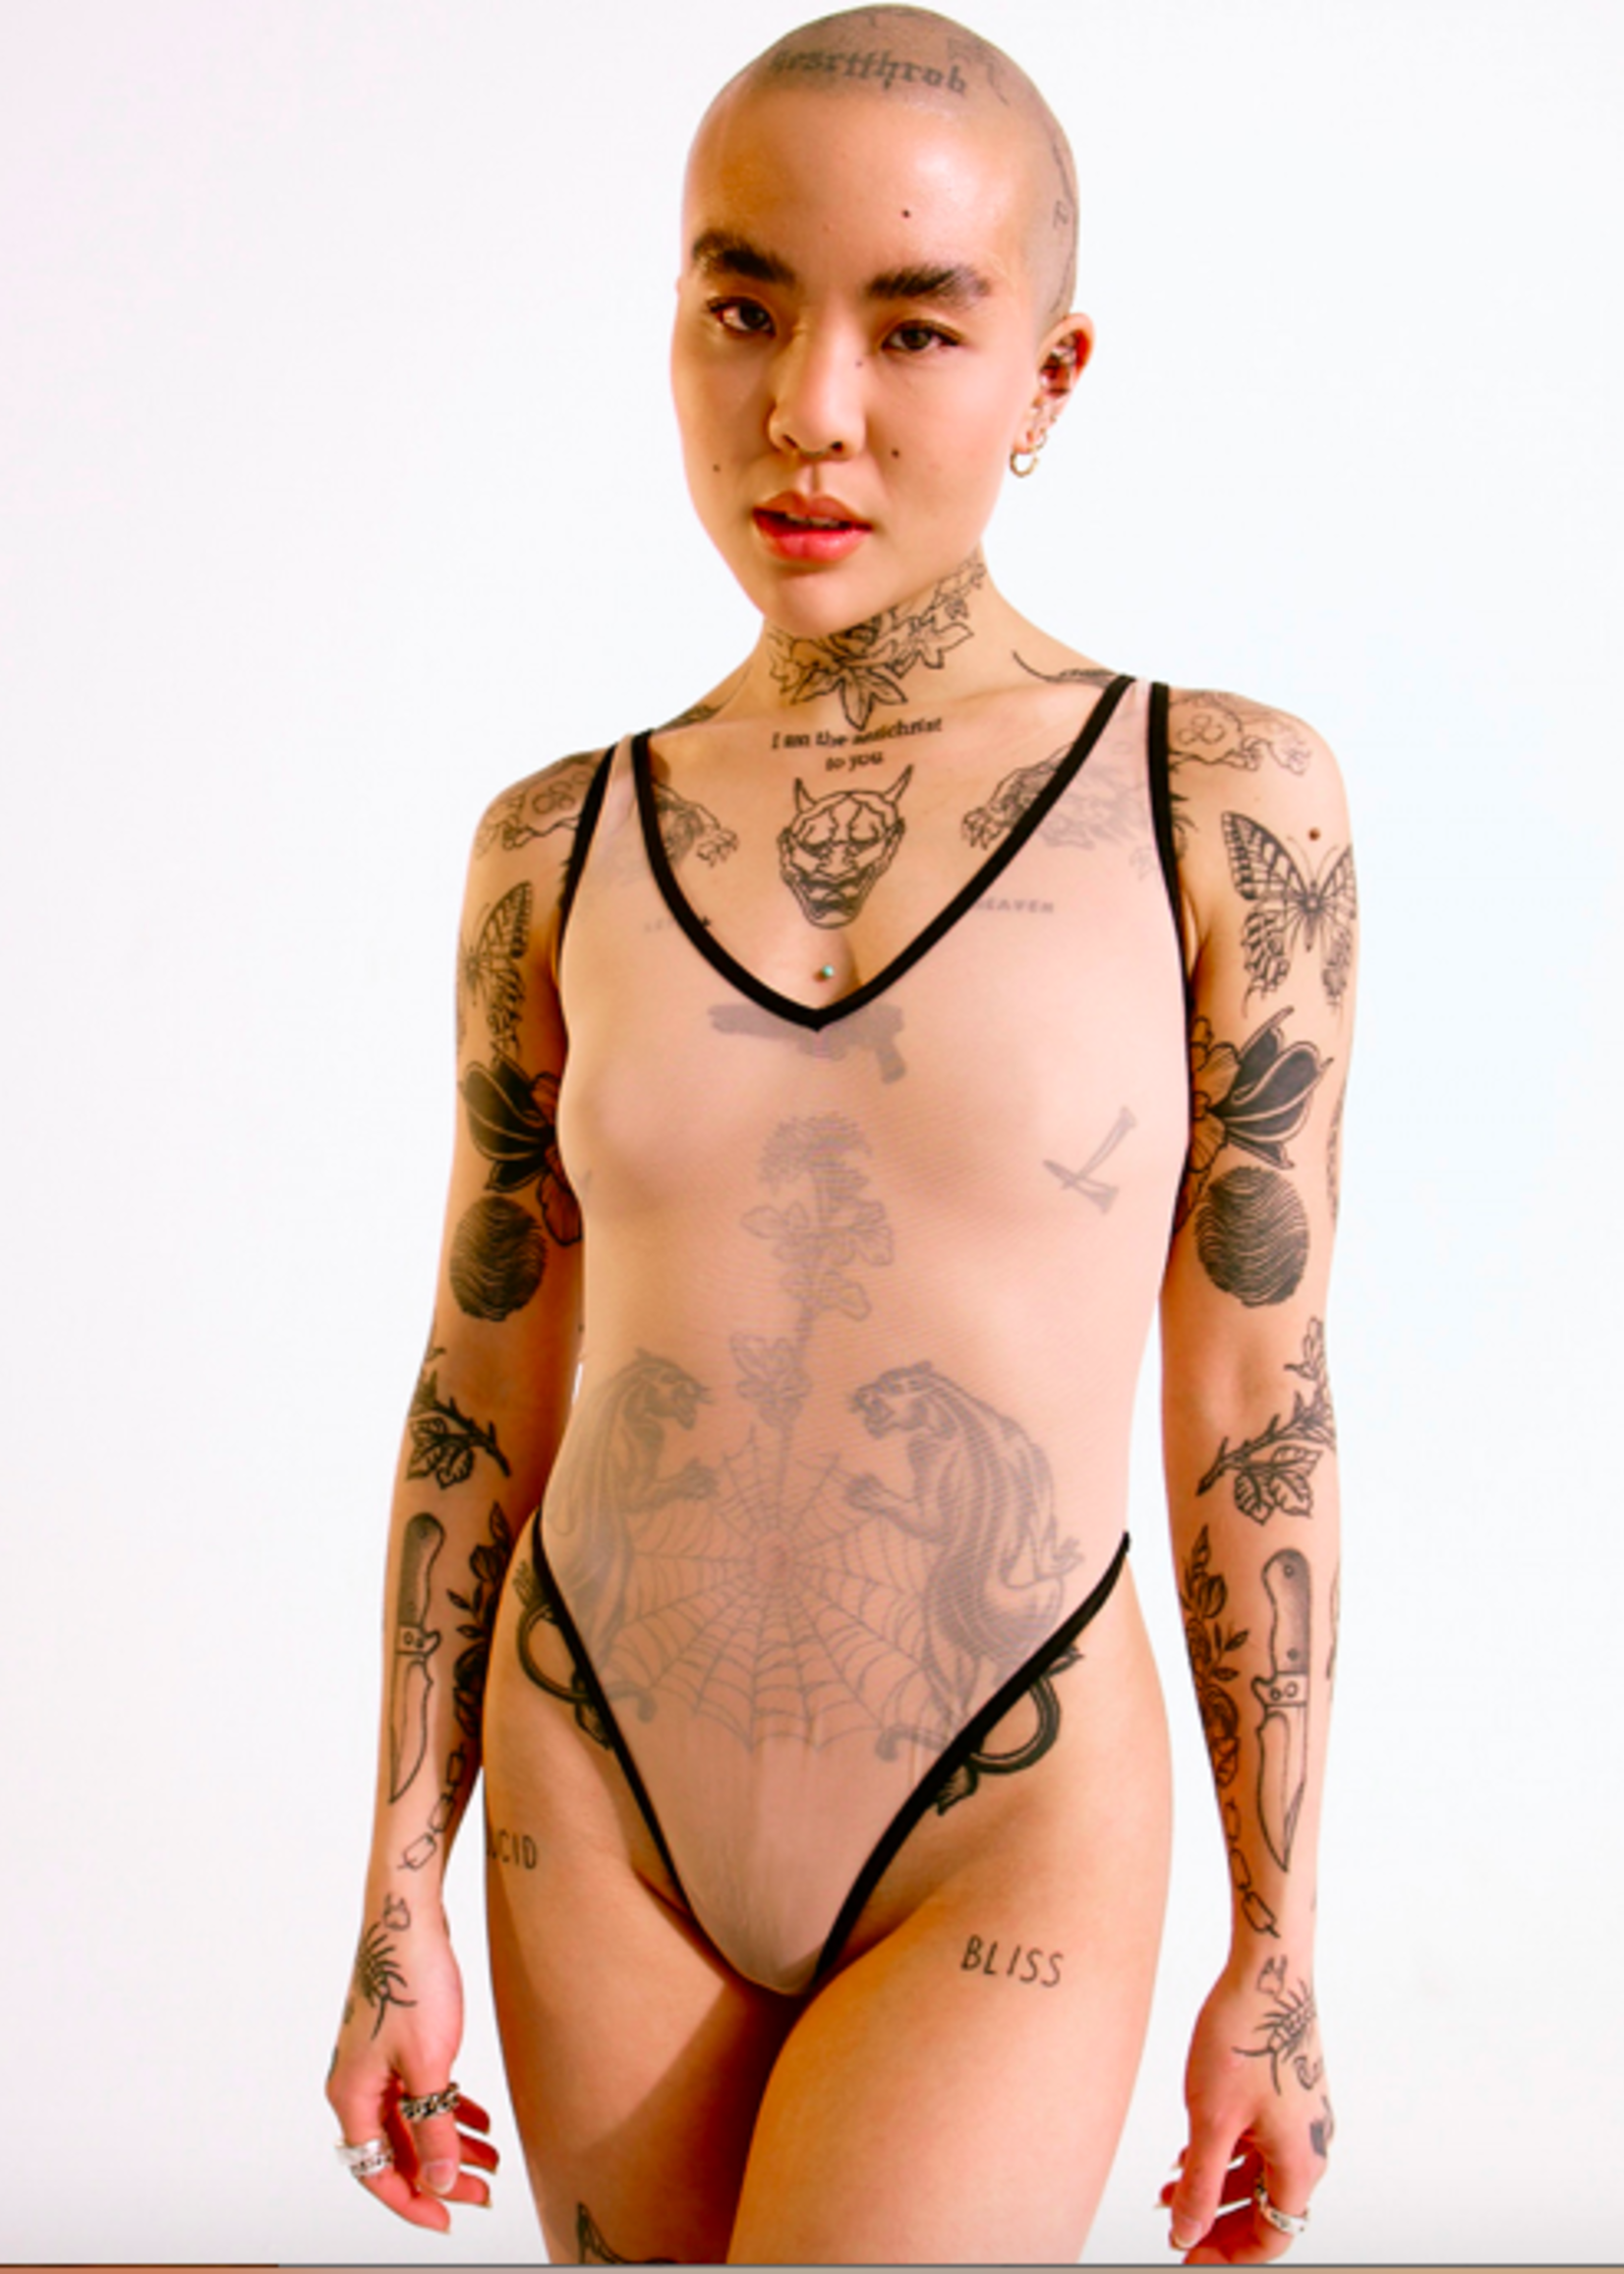 Blush Lingerie Mei Pang x Blush Mesh Bodysuit by Blush Lingerie